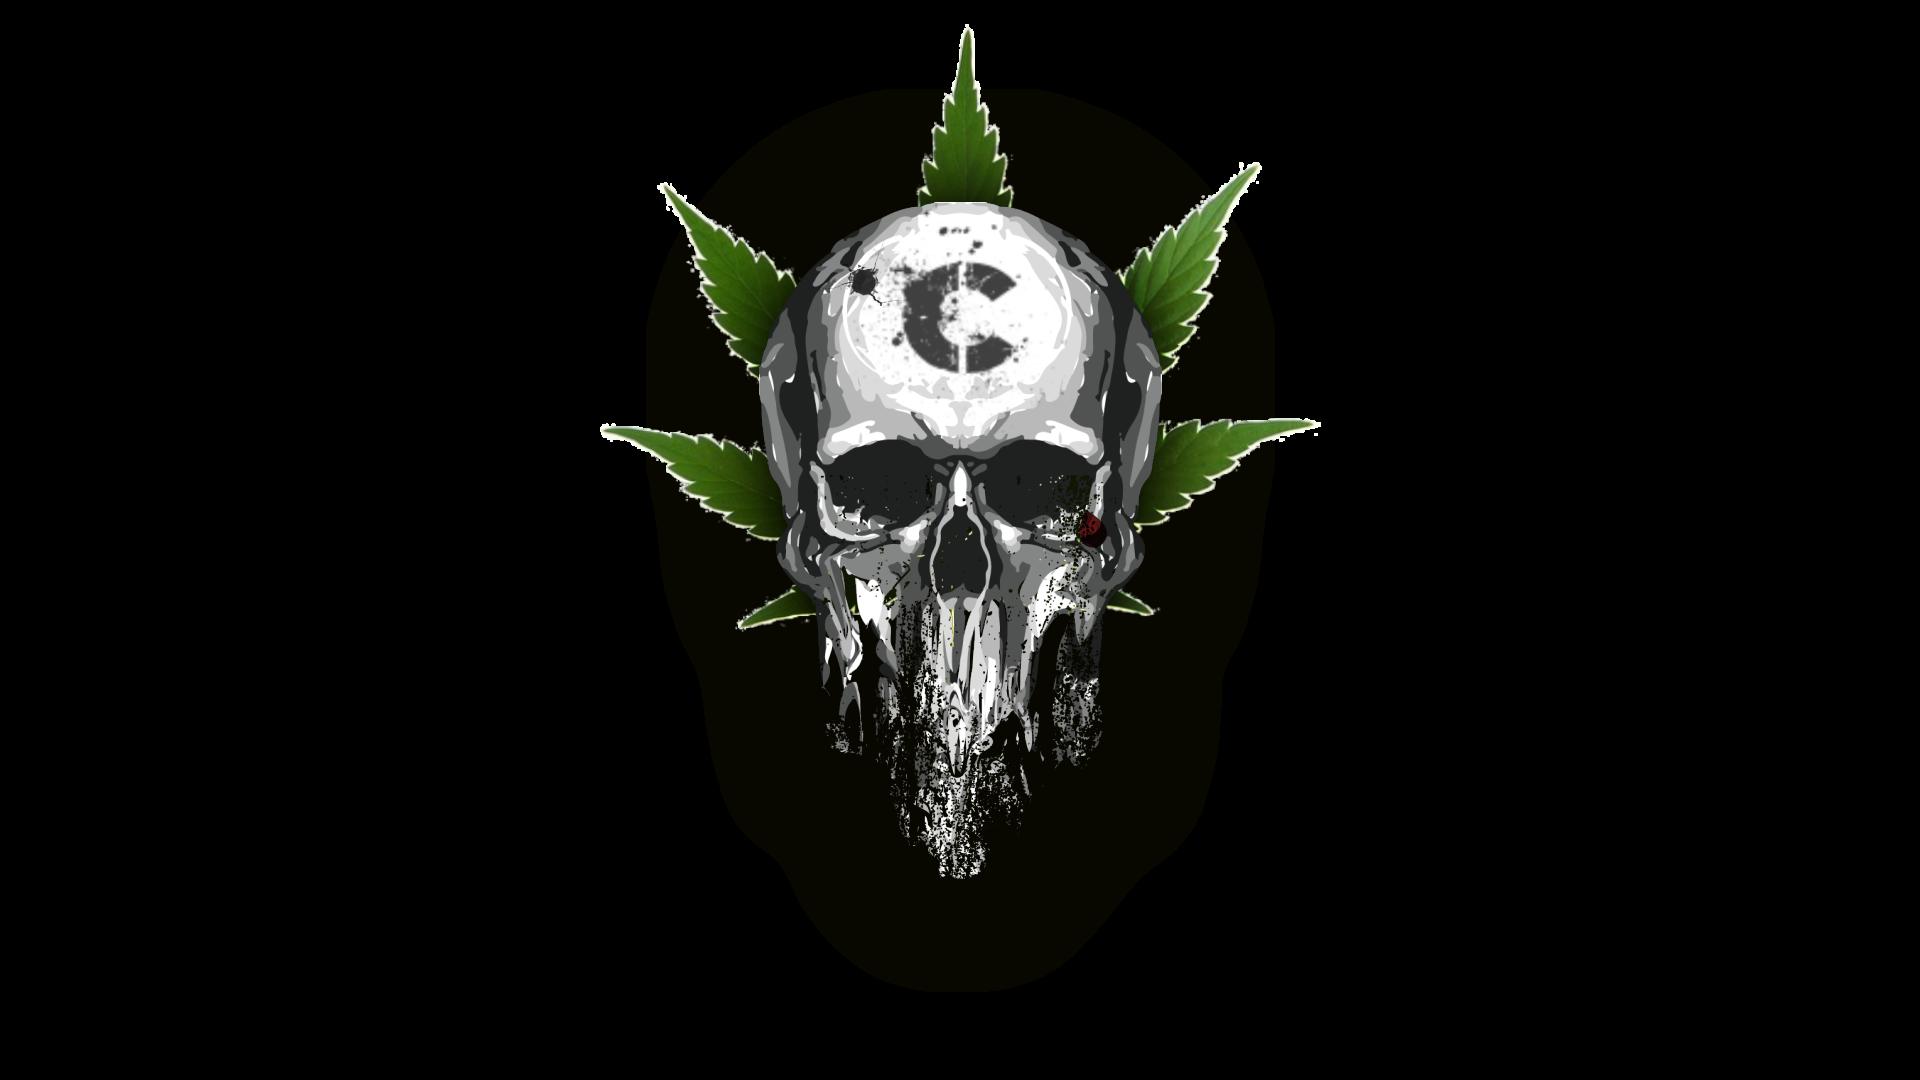 C_Block_-_Icon_Logo.png.09c3a8aa11f801c65951bfd69d5bfb67.png